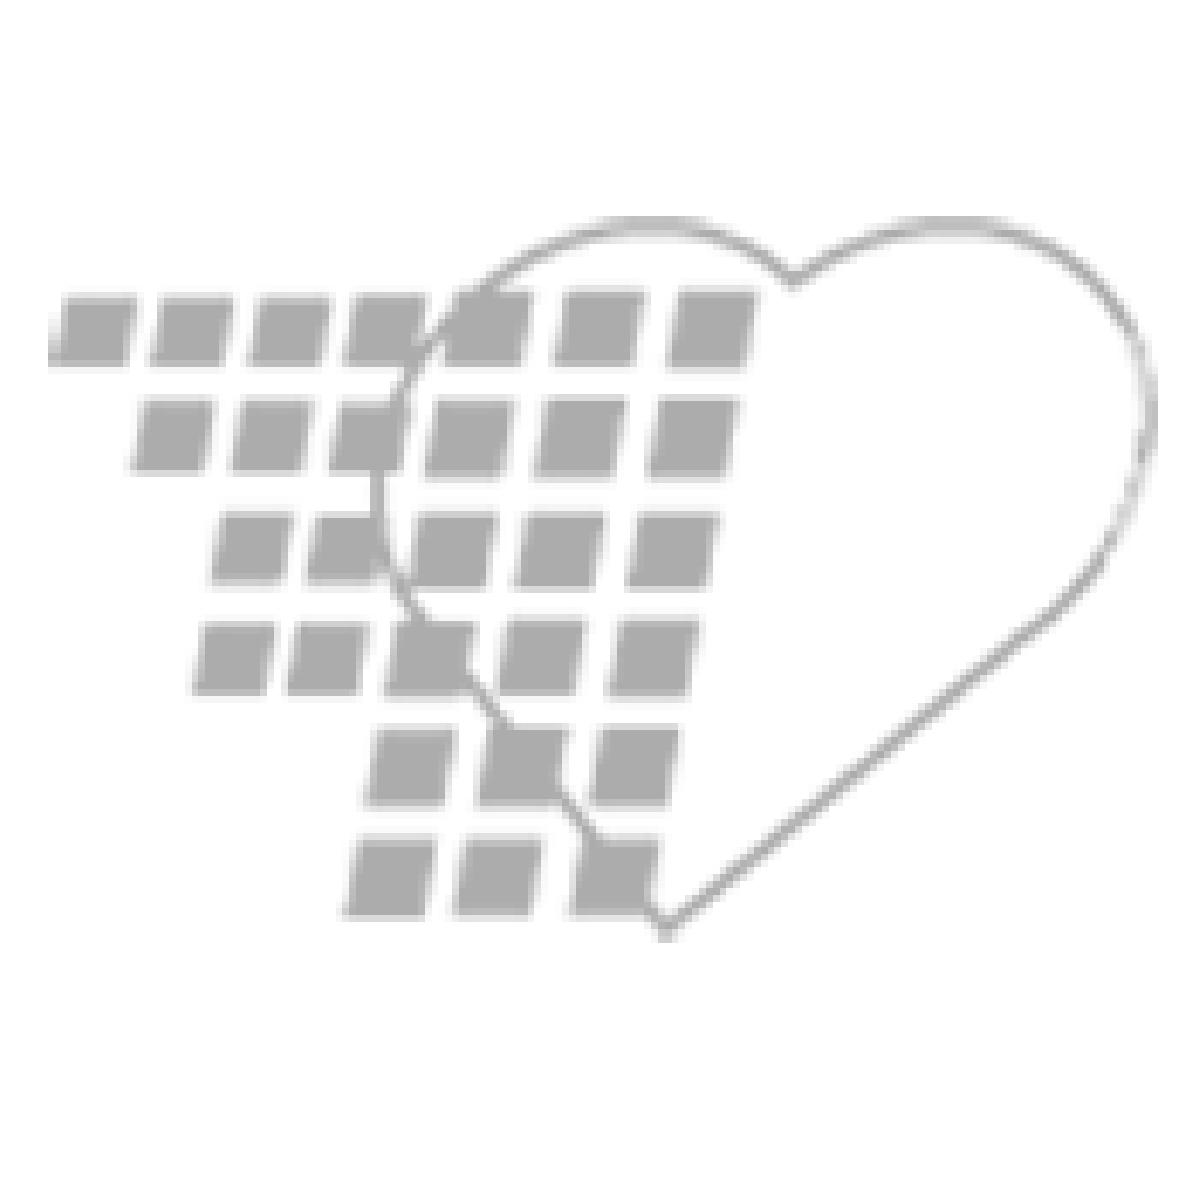 06-93-1119 Demo Dose® Adenosin (Adenocrd) 6mg/2mL 2mL